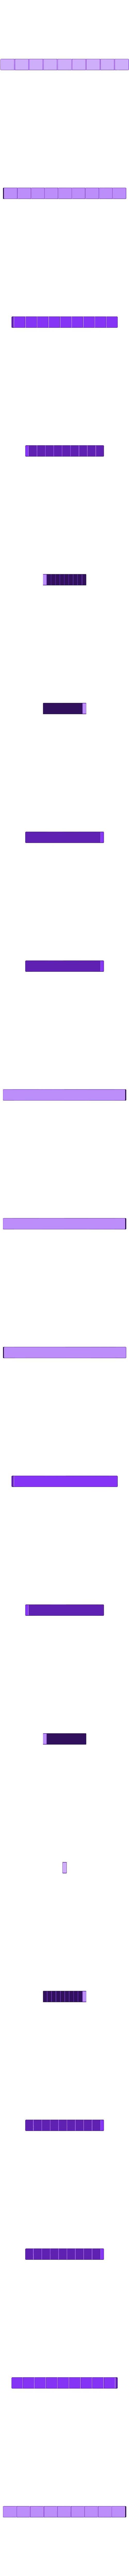 spool_cradel_cross_bar.stl Download free STL file Filament Spool SyStem • 3D printable object, jimjax